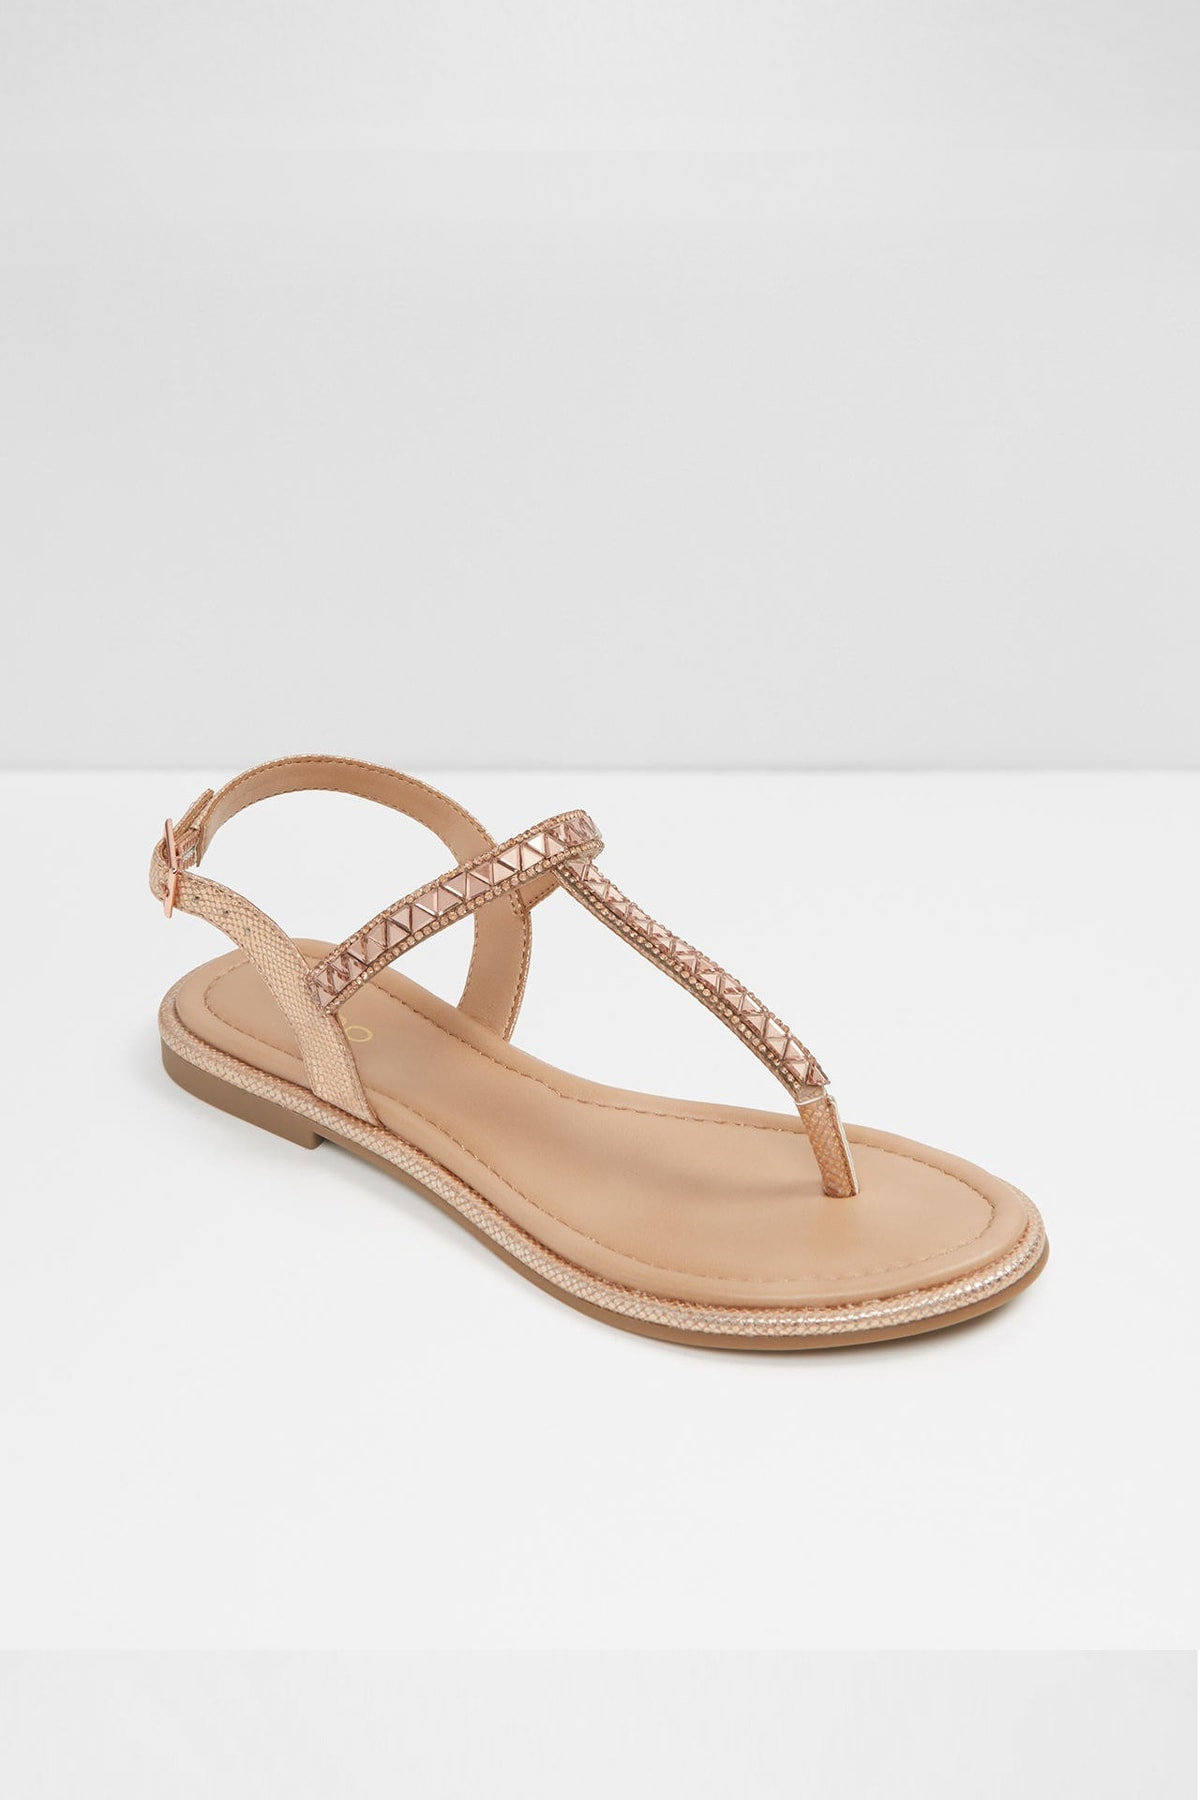 Aldo Sheeny - Pembe Kadın Sandalet 1